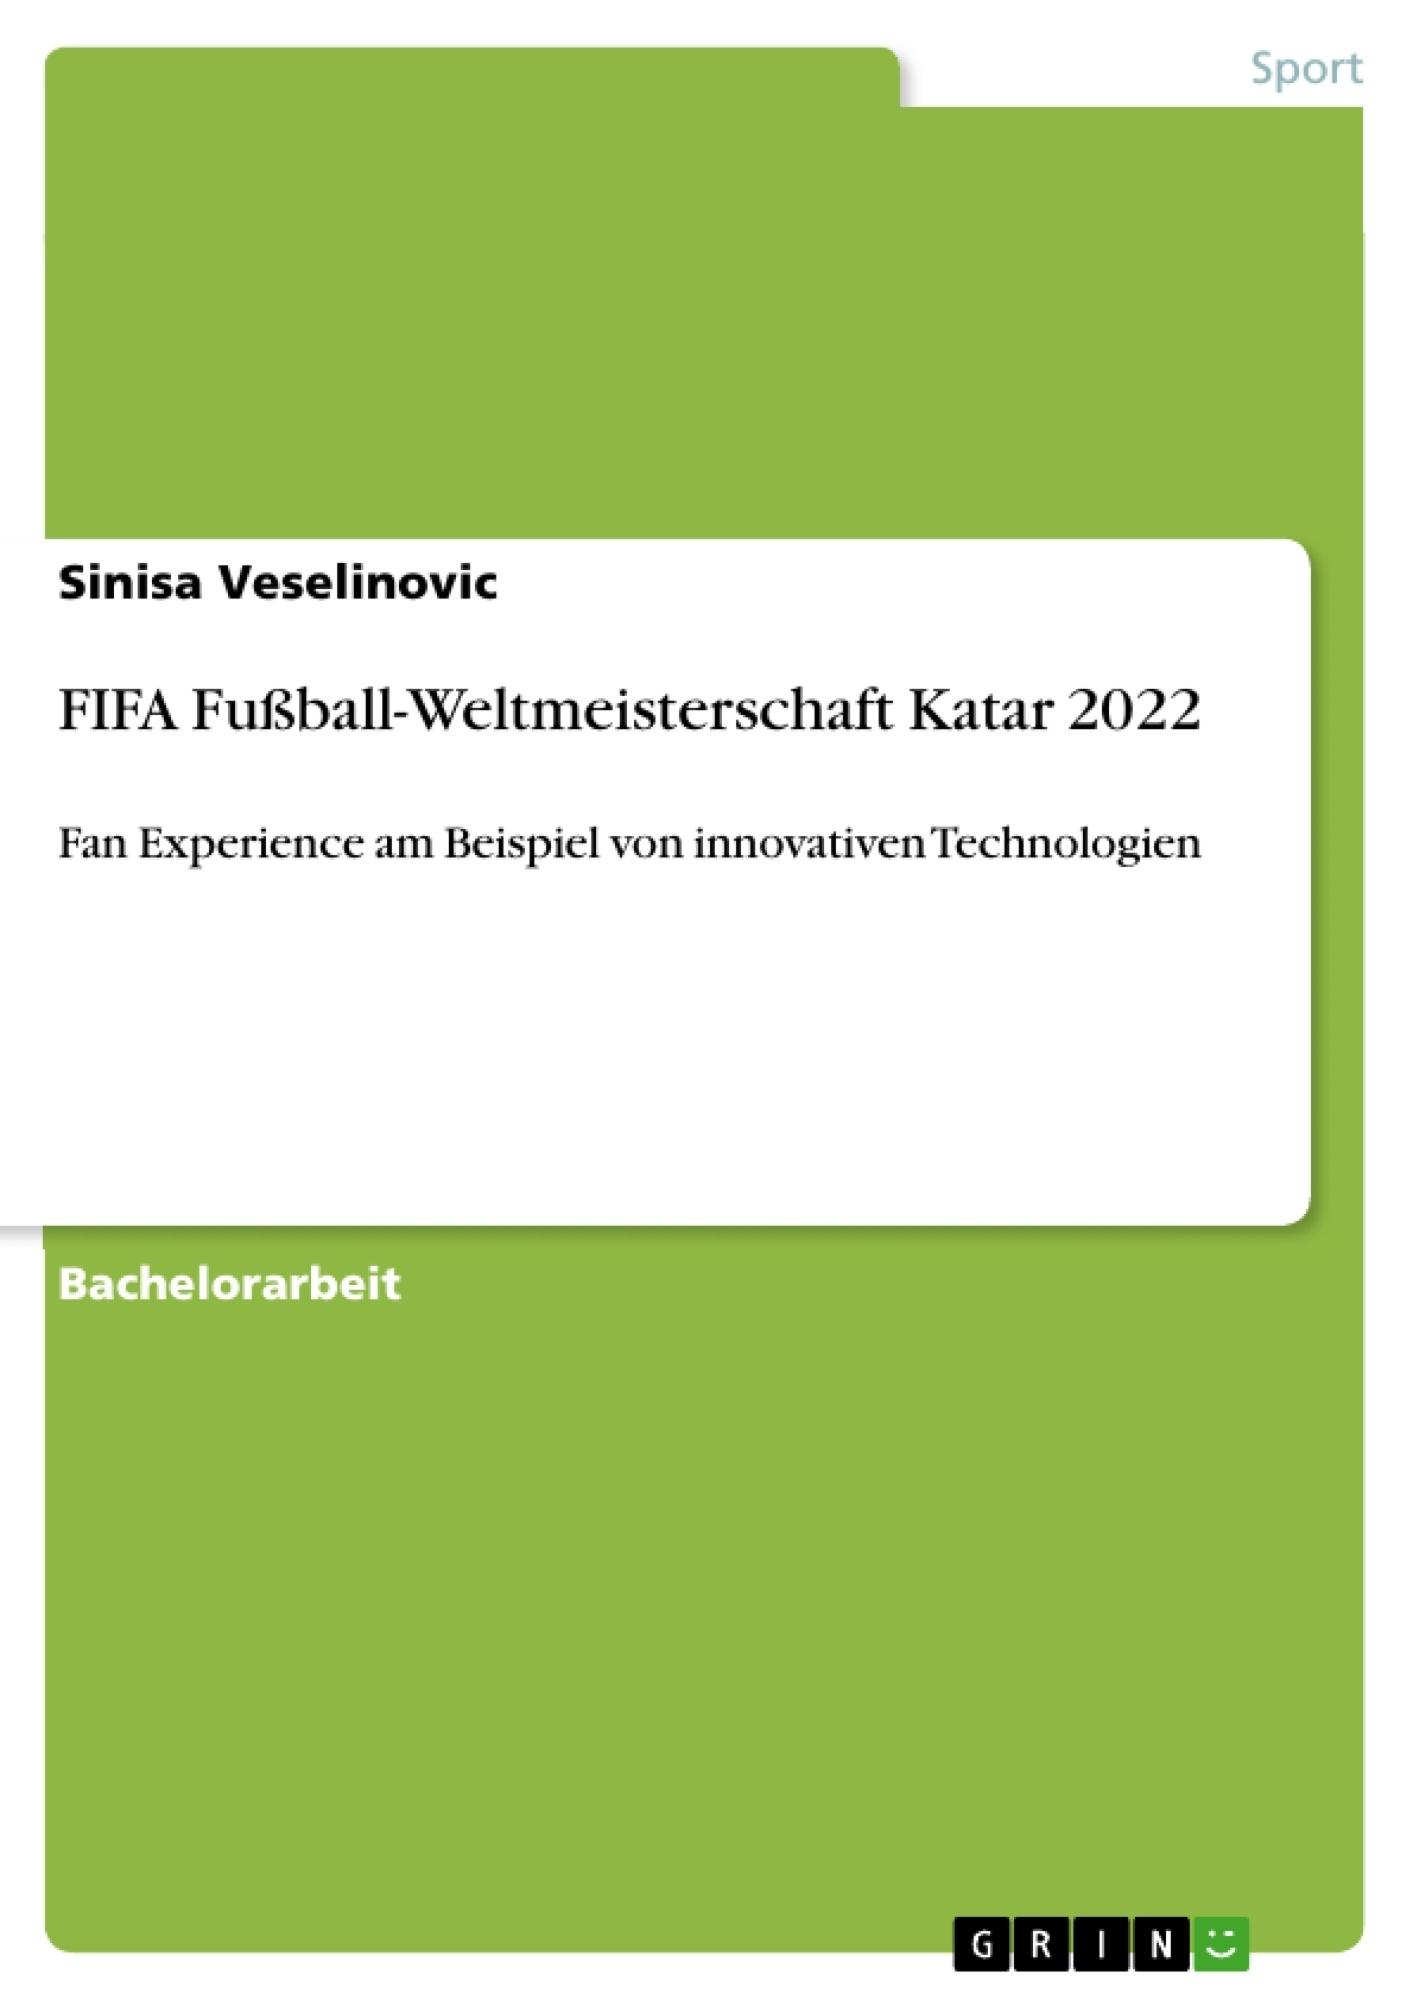 Titel: FIFA Fußball-Weltmeisterschaft Katar 2022